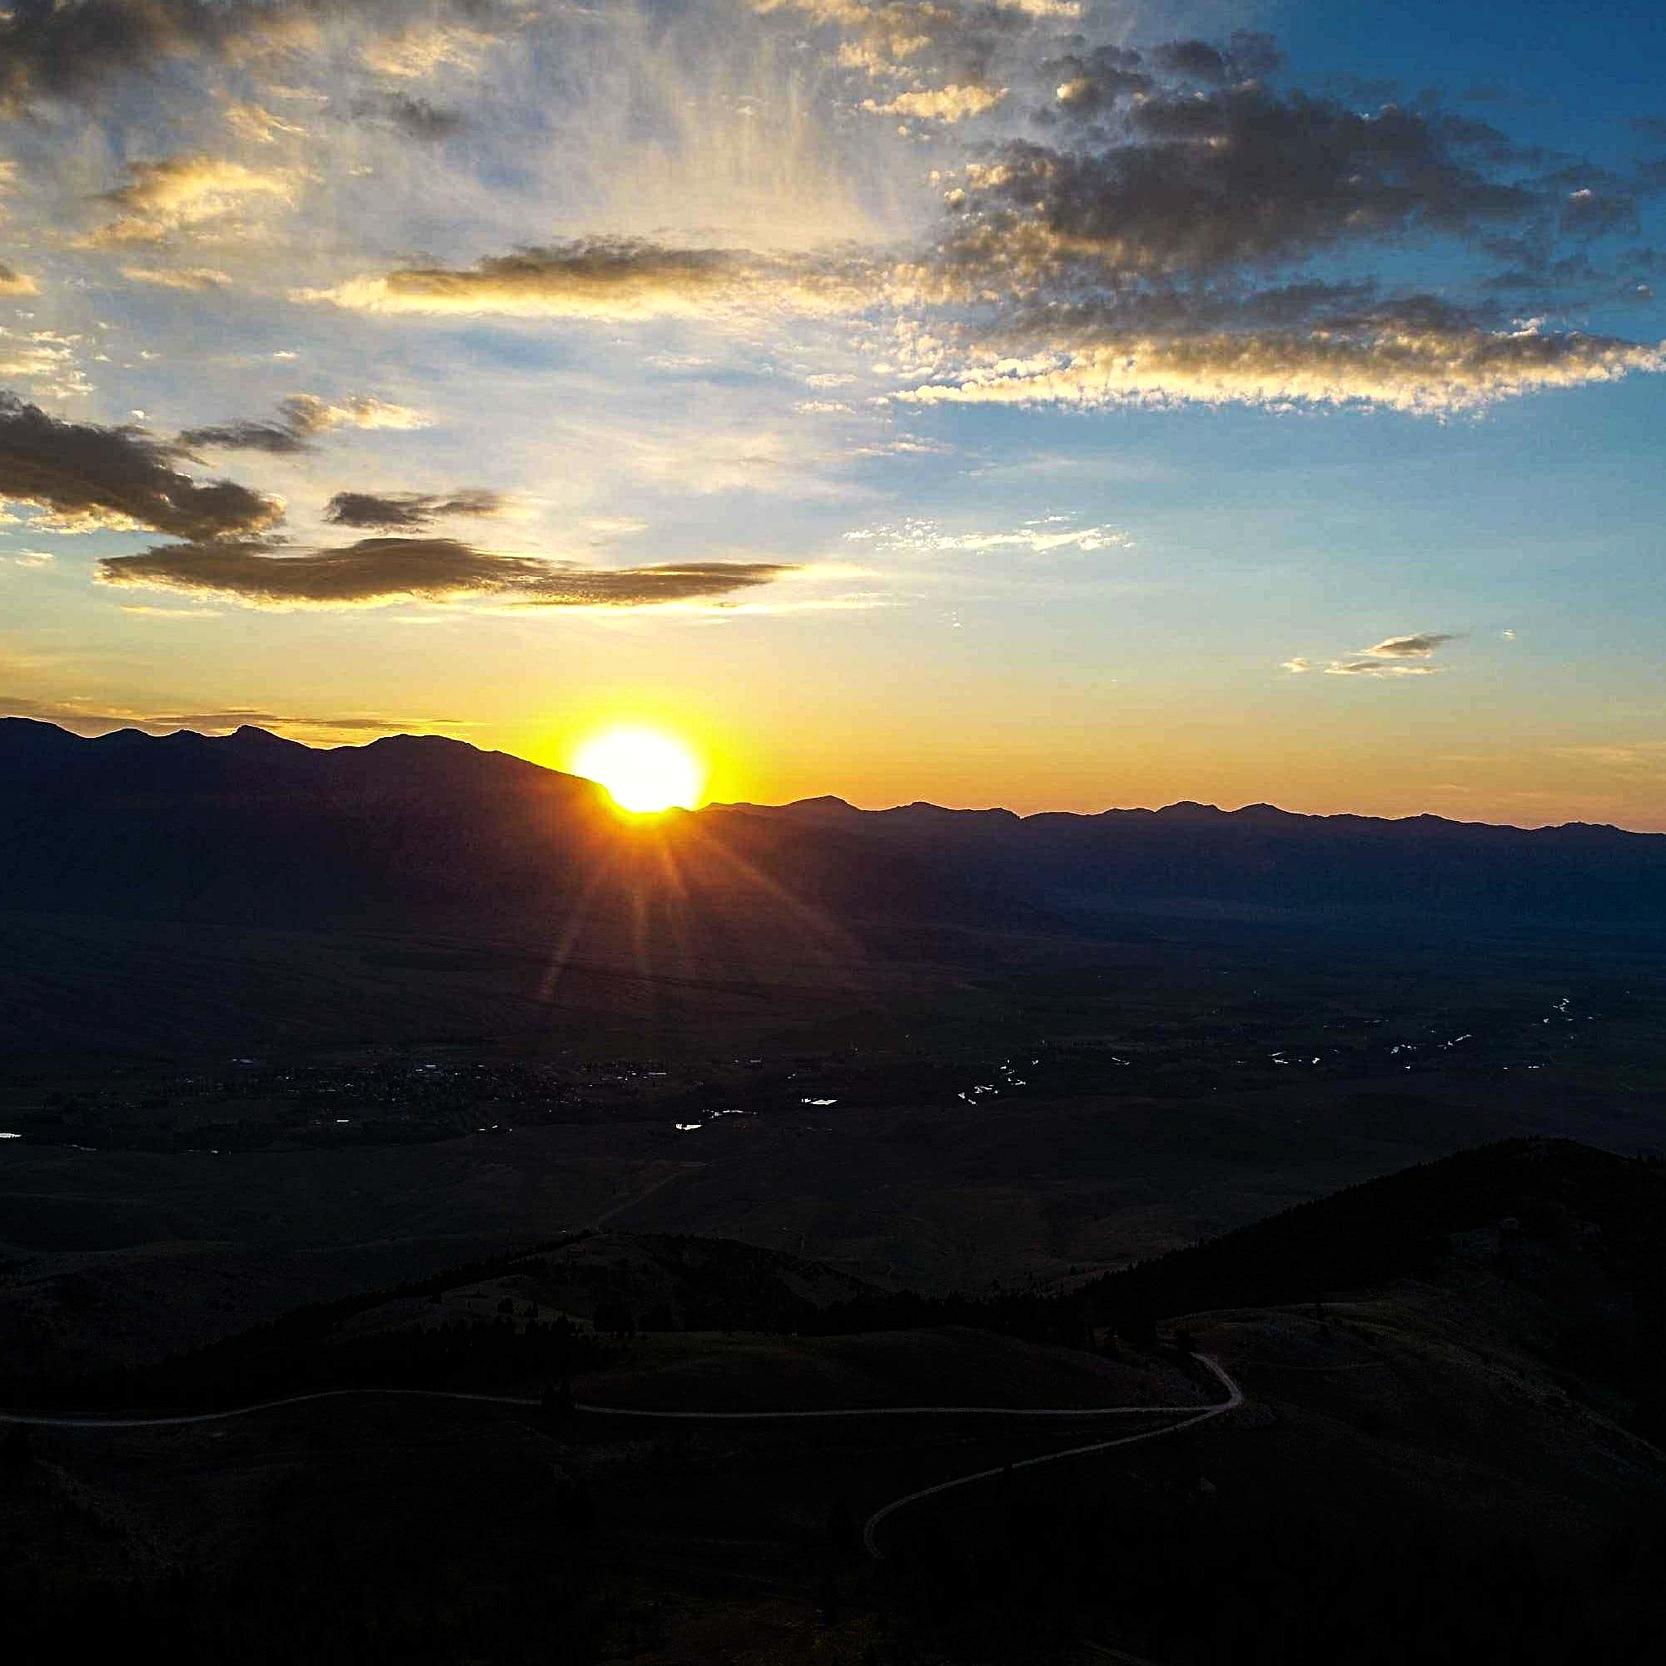 Brandon Hill Flashnote - 24 October 2017Phoenix Announces Addition of Copper-Cobalt Properties in Idaho